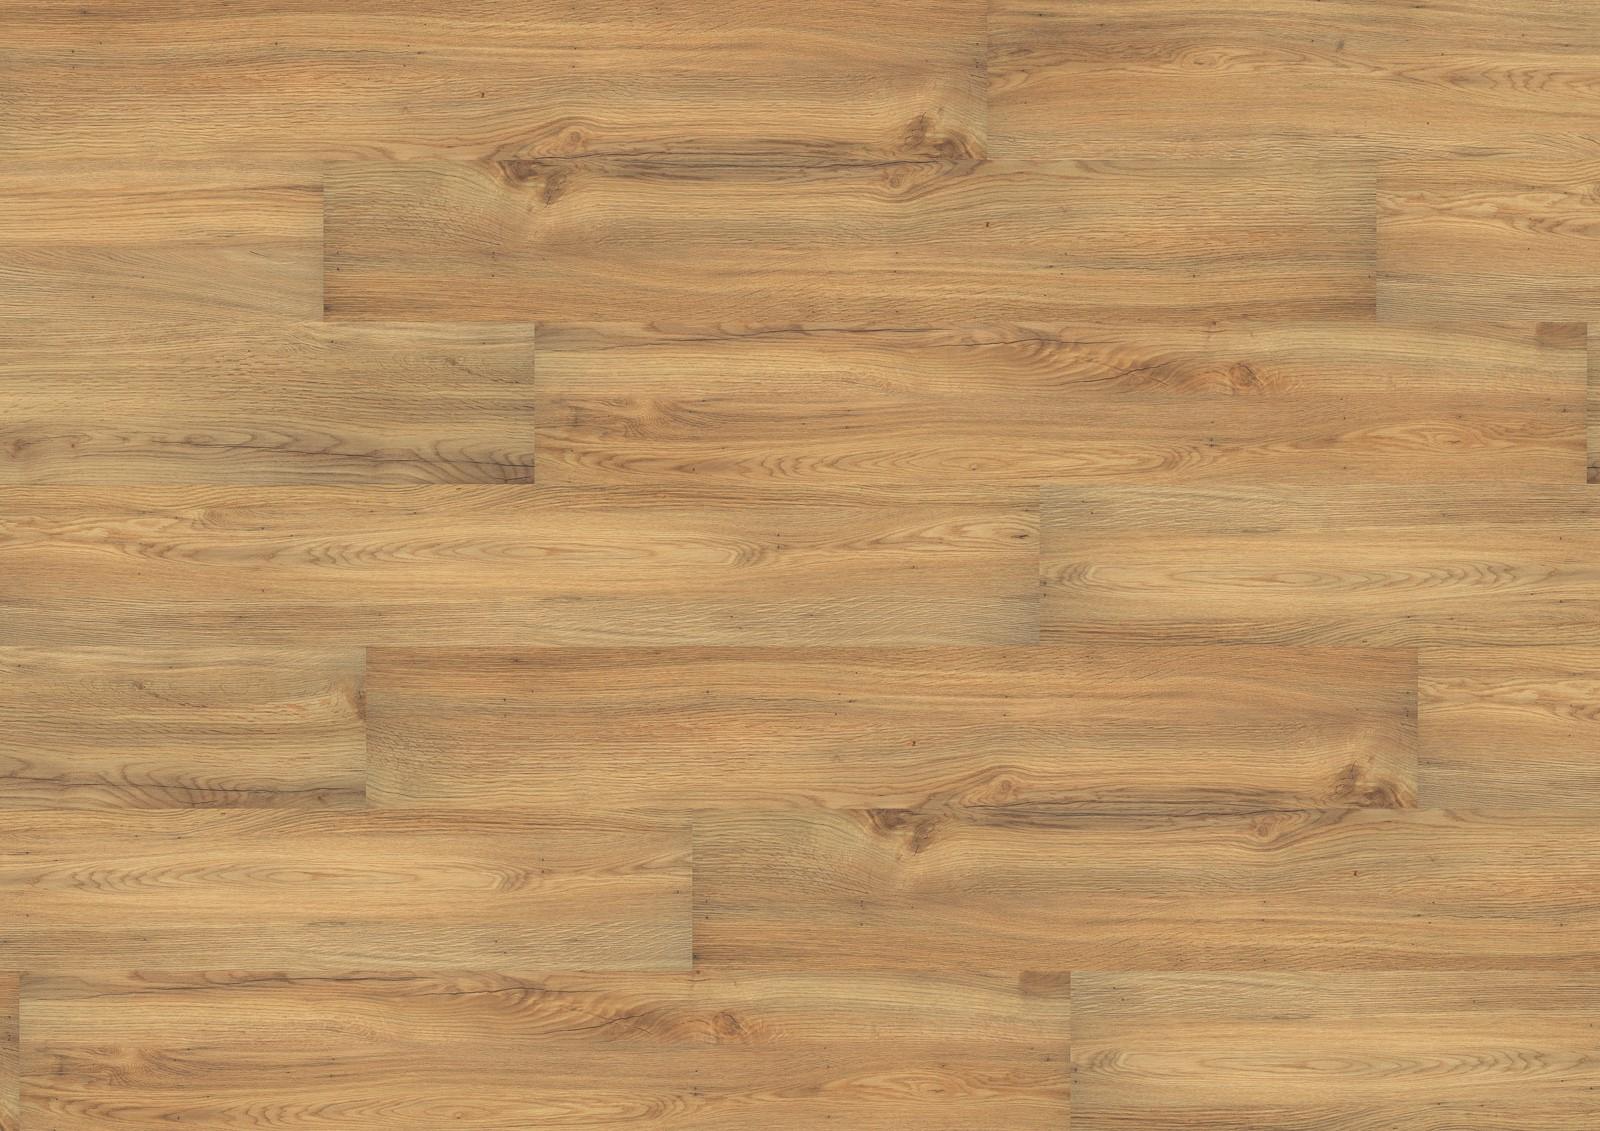 wineo purline 9 mm klick canyon oak inkl trittschall wineo 1000 wood xl. Black Bedroom Furniture Sets. Home Design Ideas